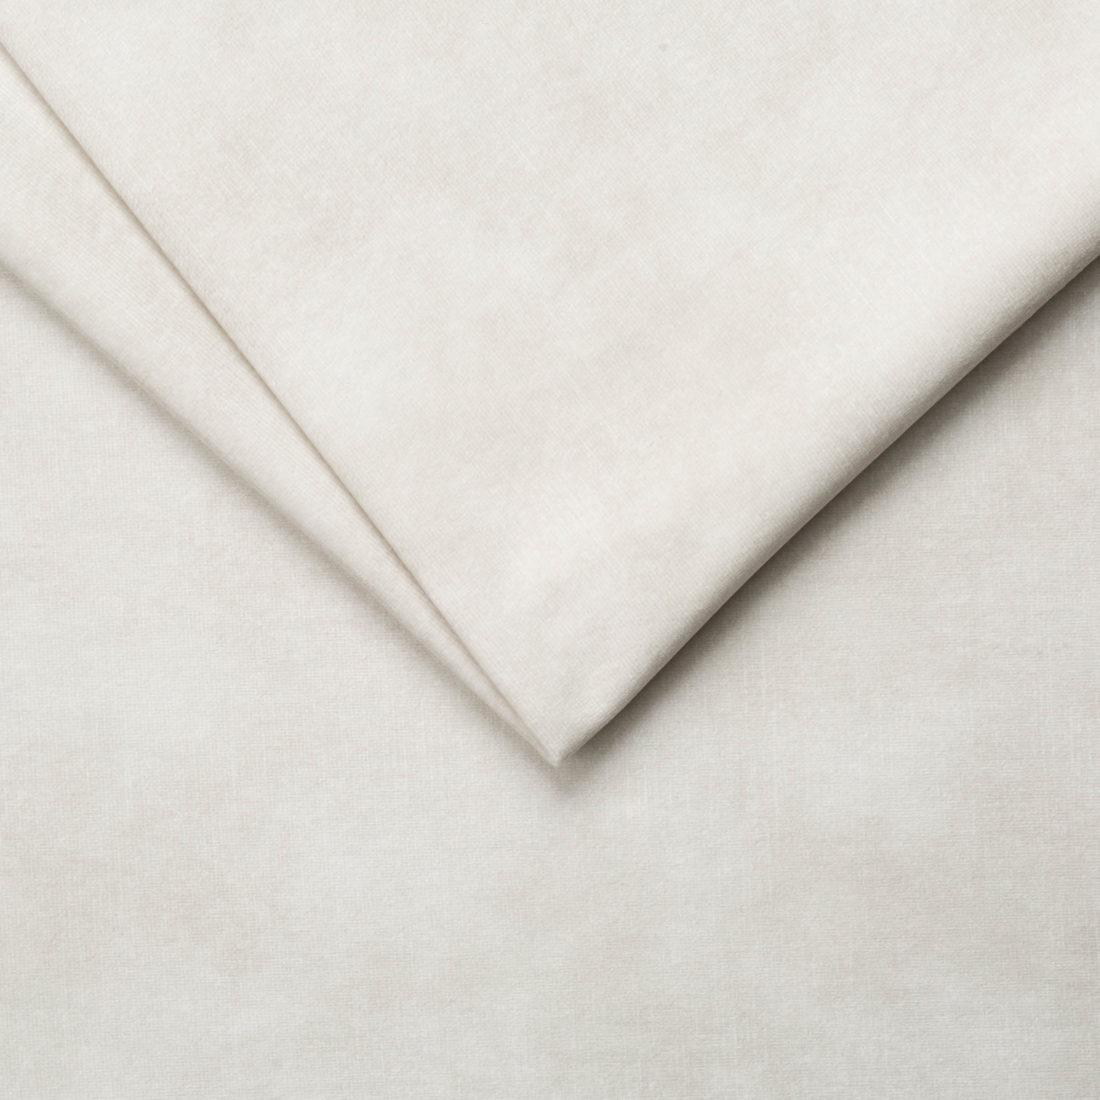 Меблева тканина Palladium 1 Champagne, велюр